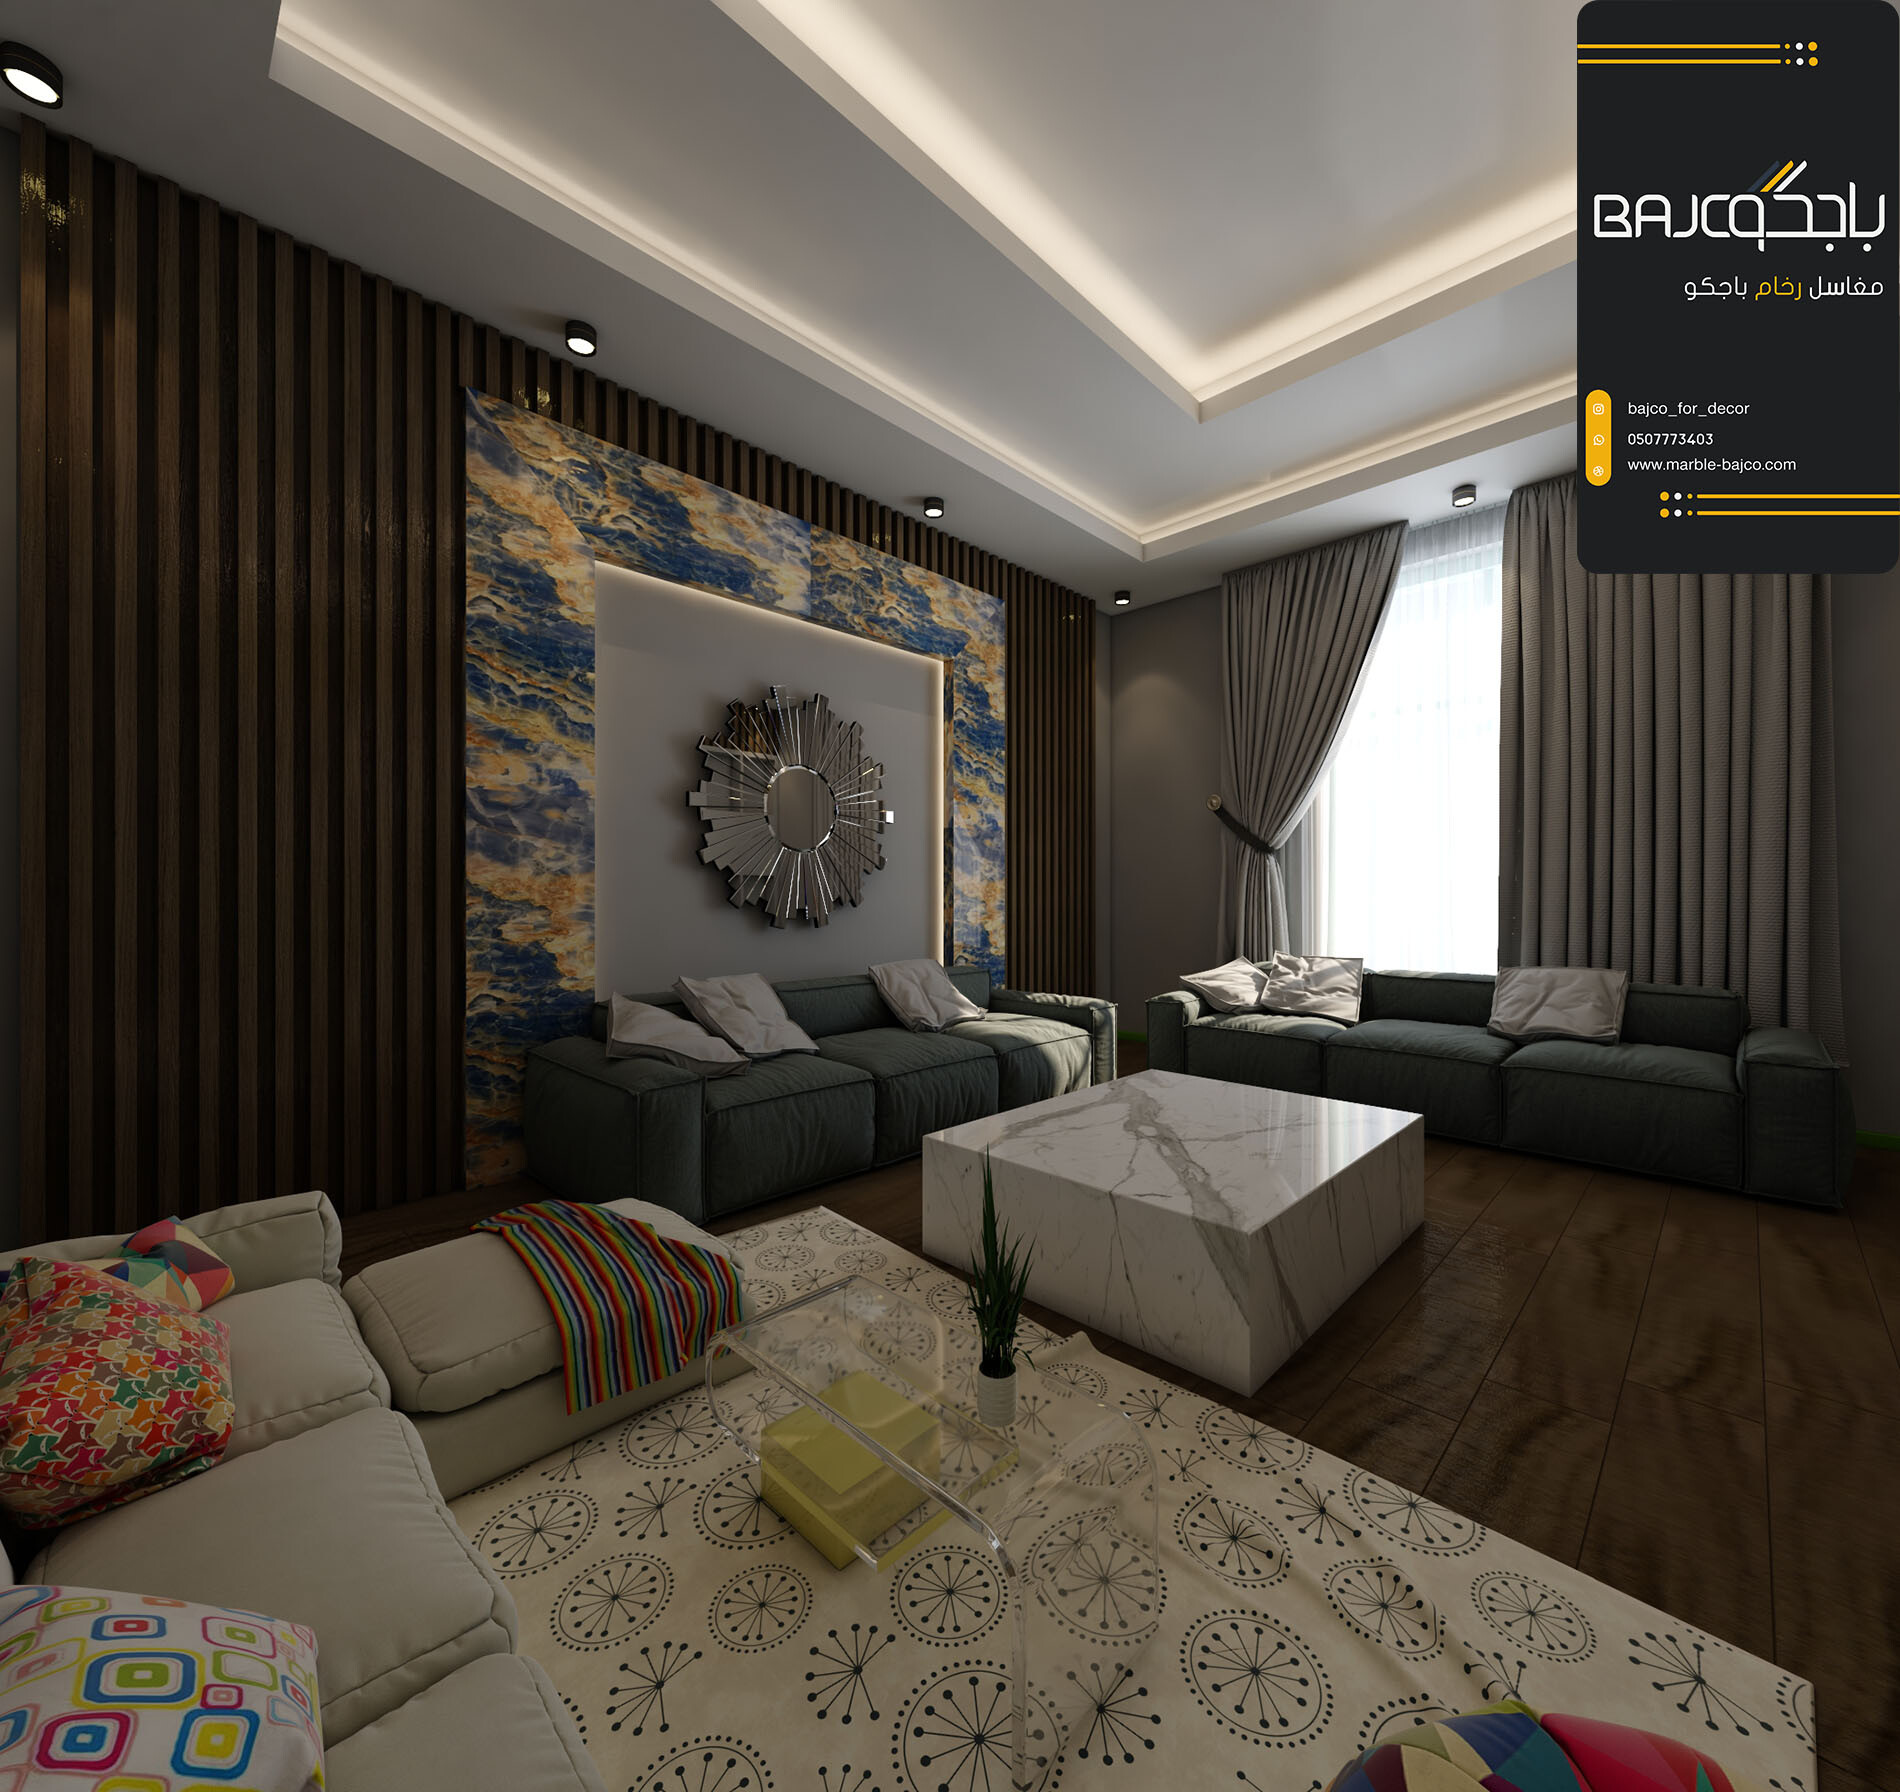 تصميم living room (2)